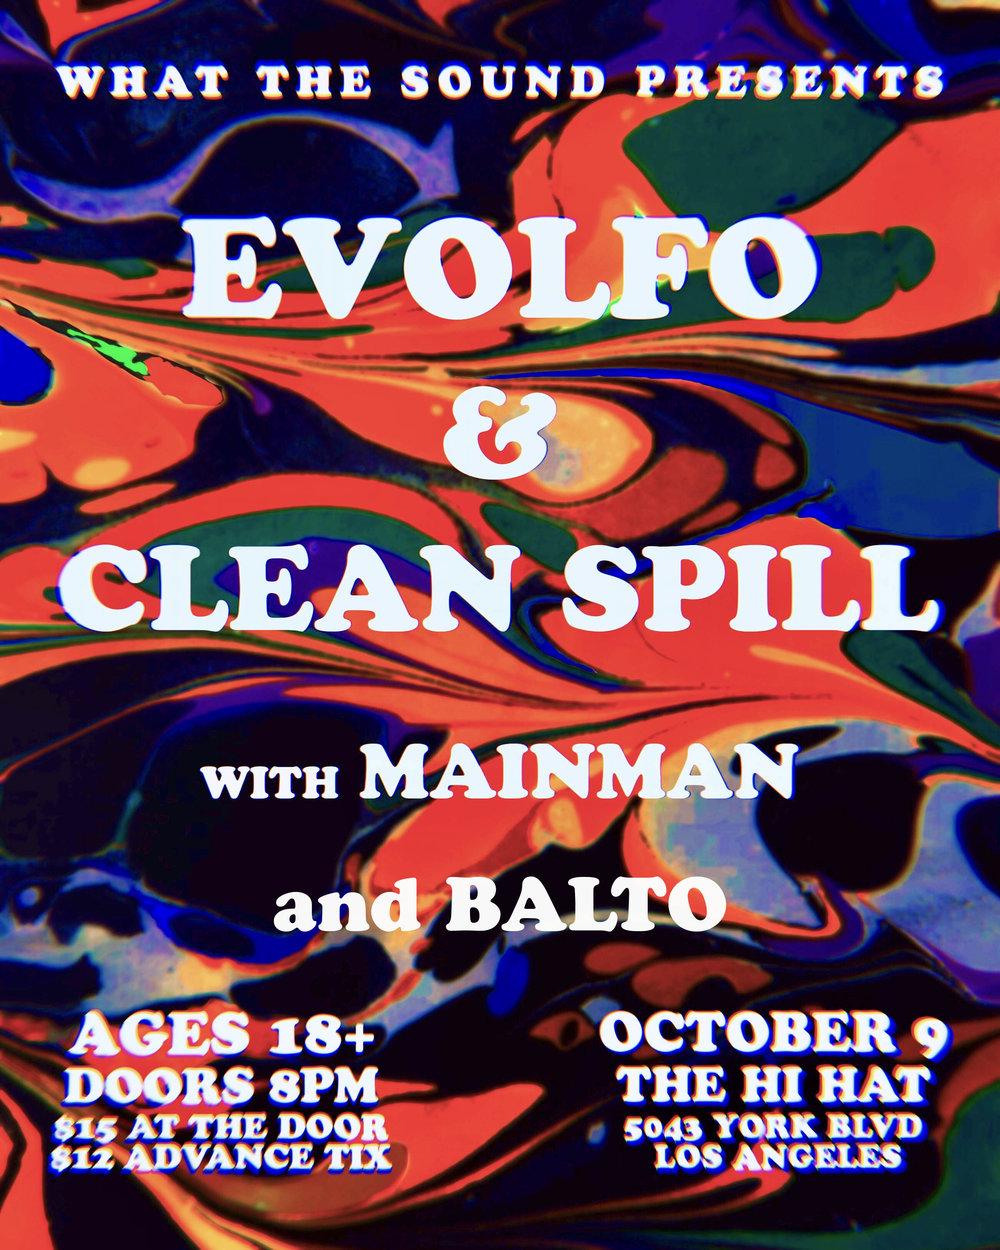 EVOLFO / CLEAN SPILL / MAINMAN / BALTO - Art by @logothettiOctober 9 @ The Hi Hat$12 ADV / $15 DOORS18+